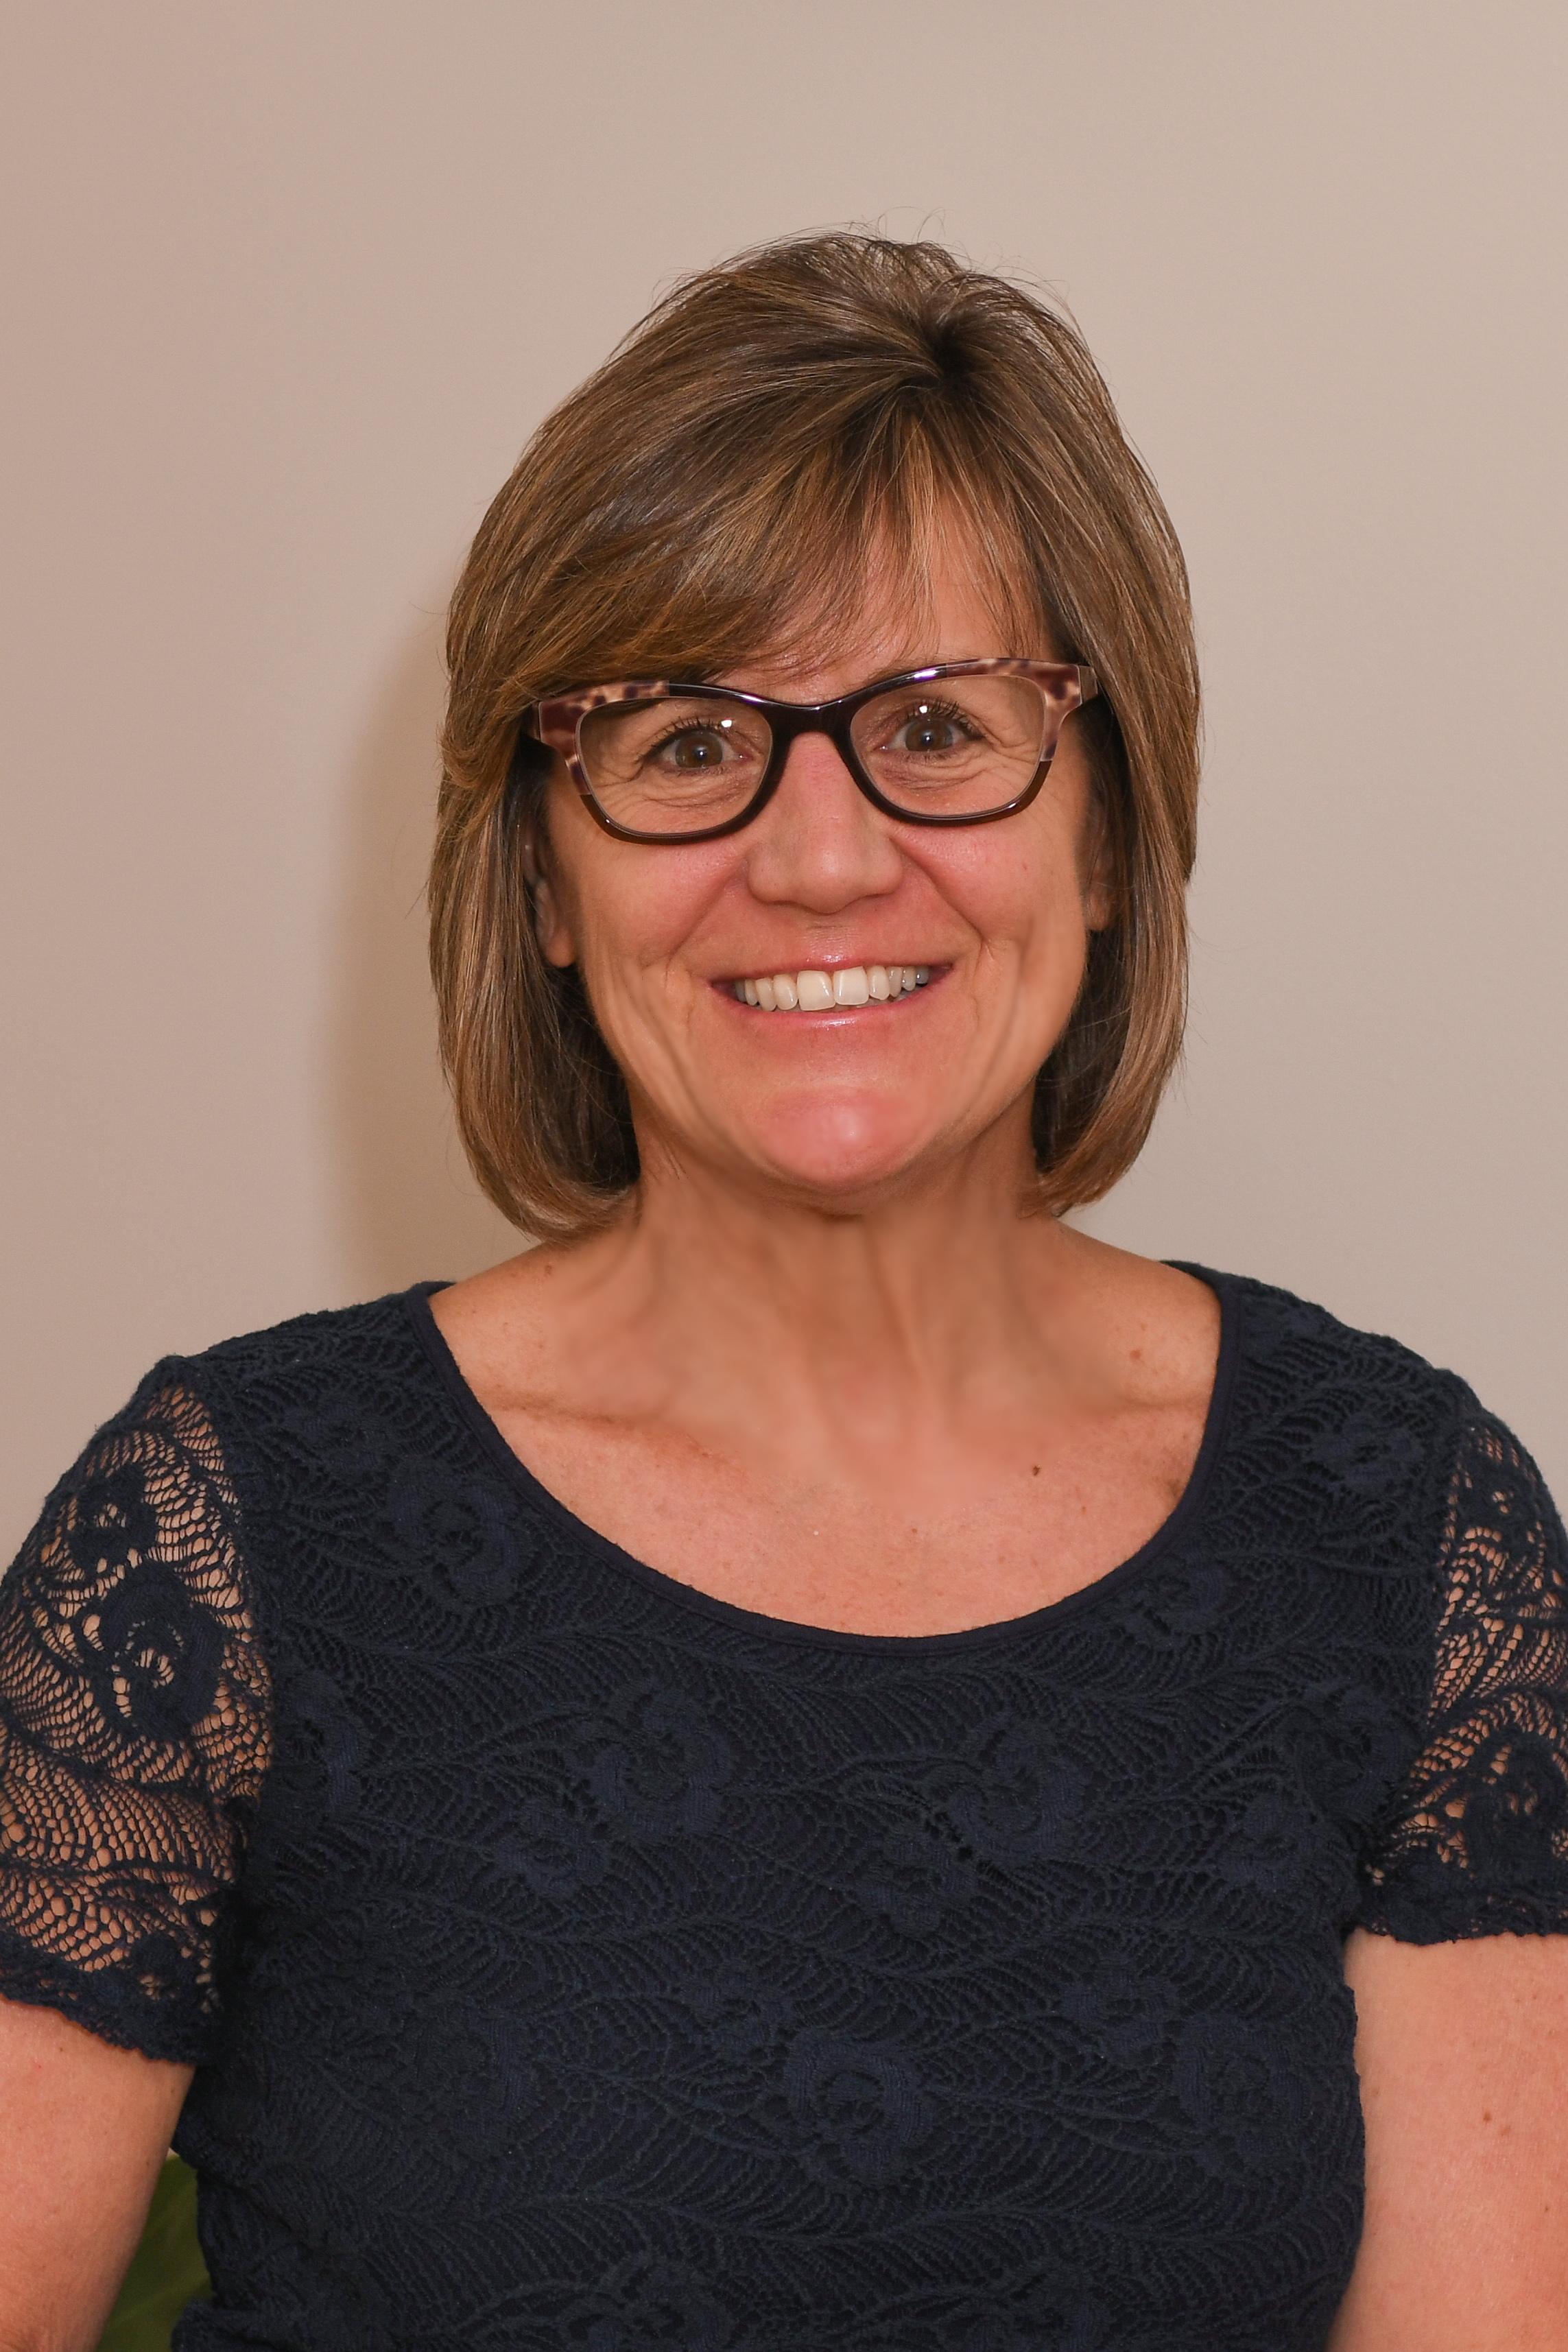 Lori Heck